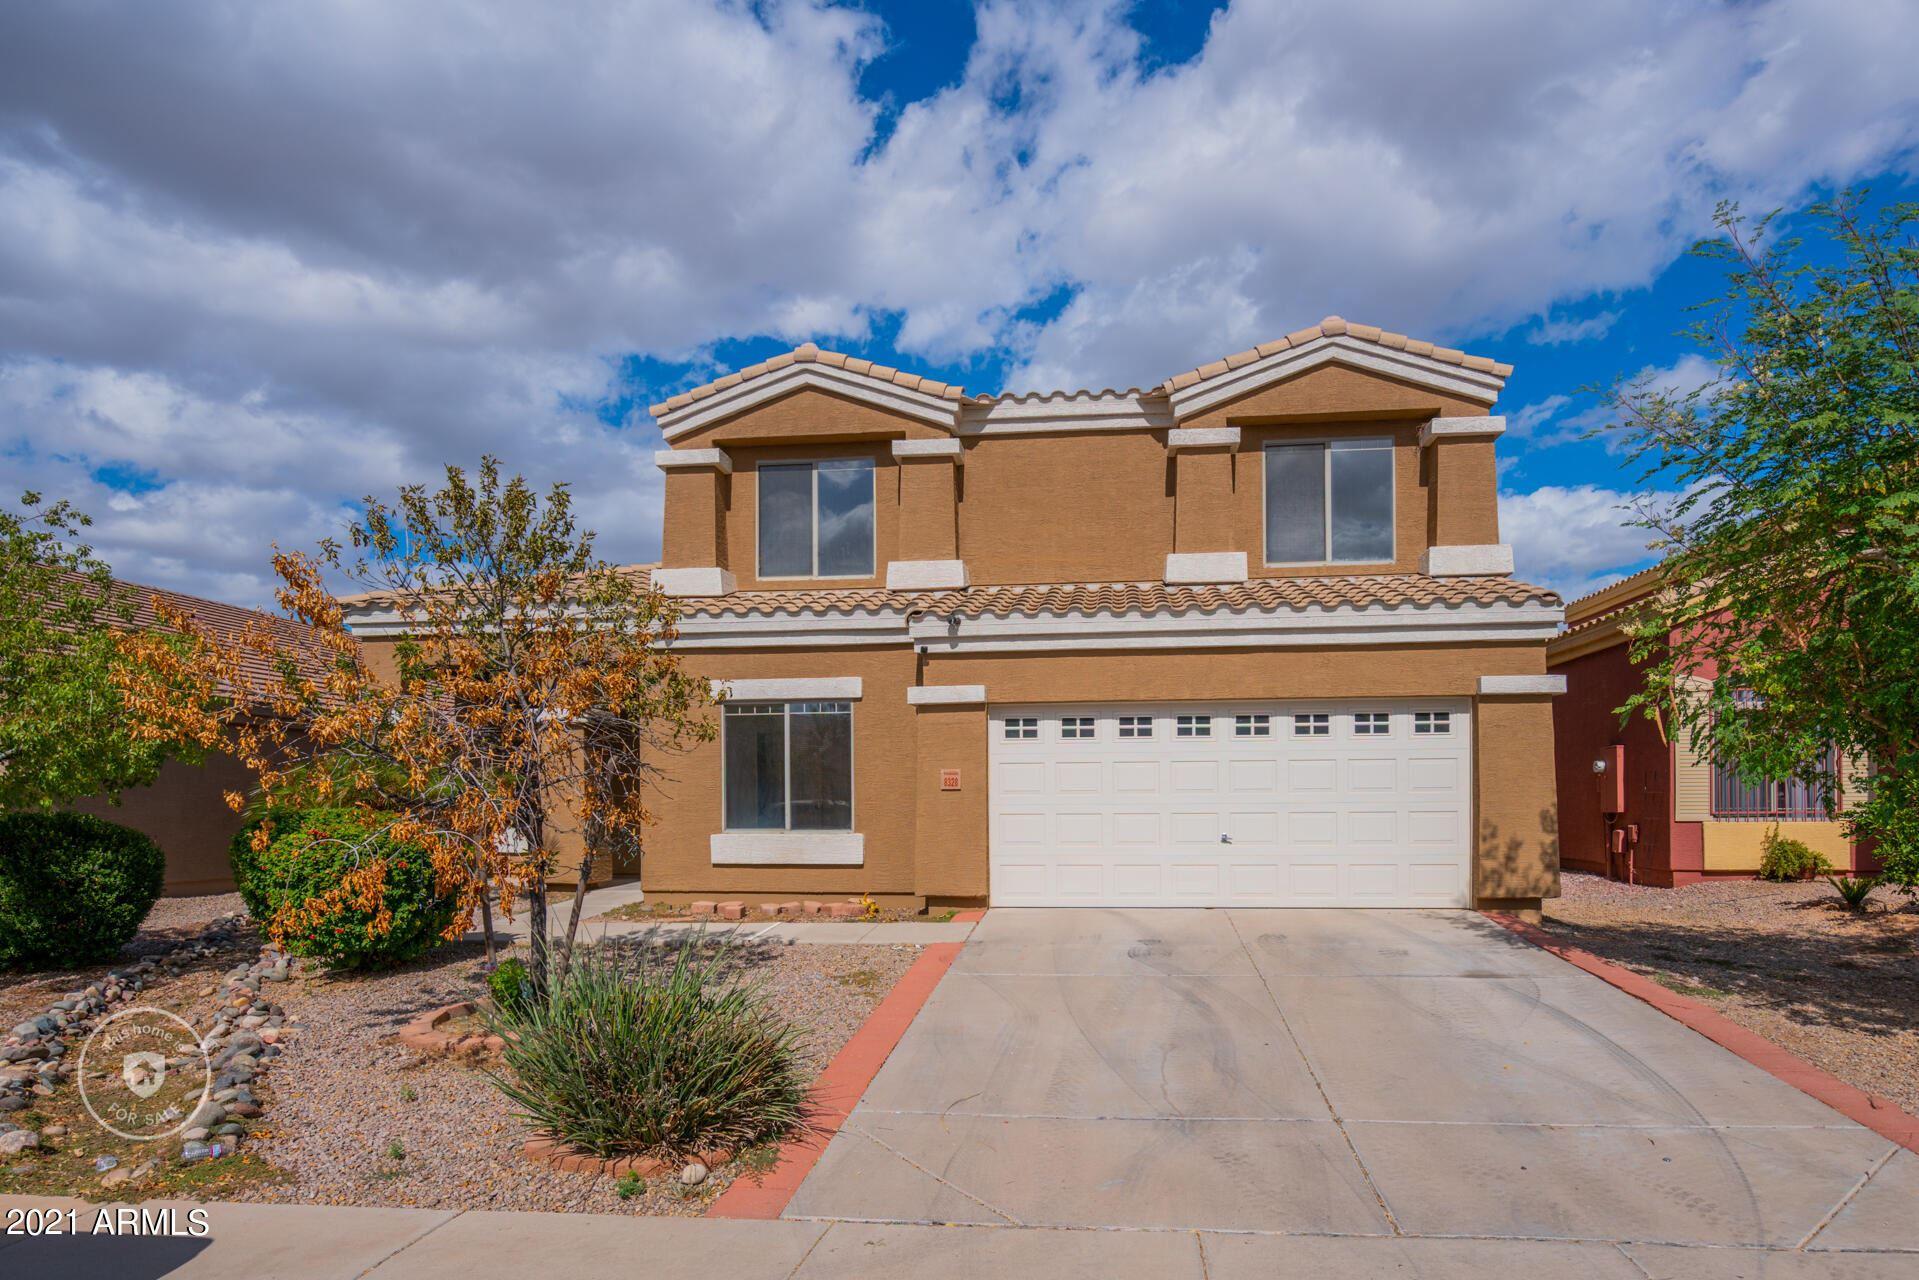 Photo of 8328 W PIONEER Street, Tolleson, AZ 85353 (MLS # 6310750)